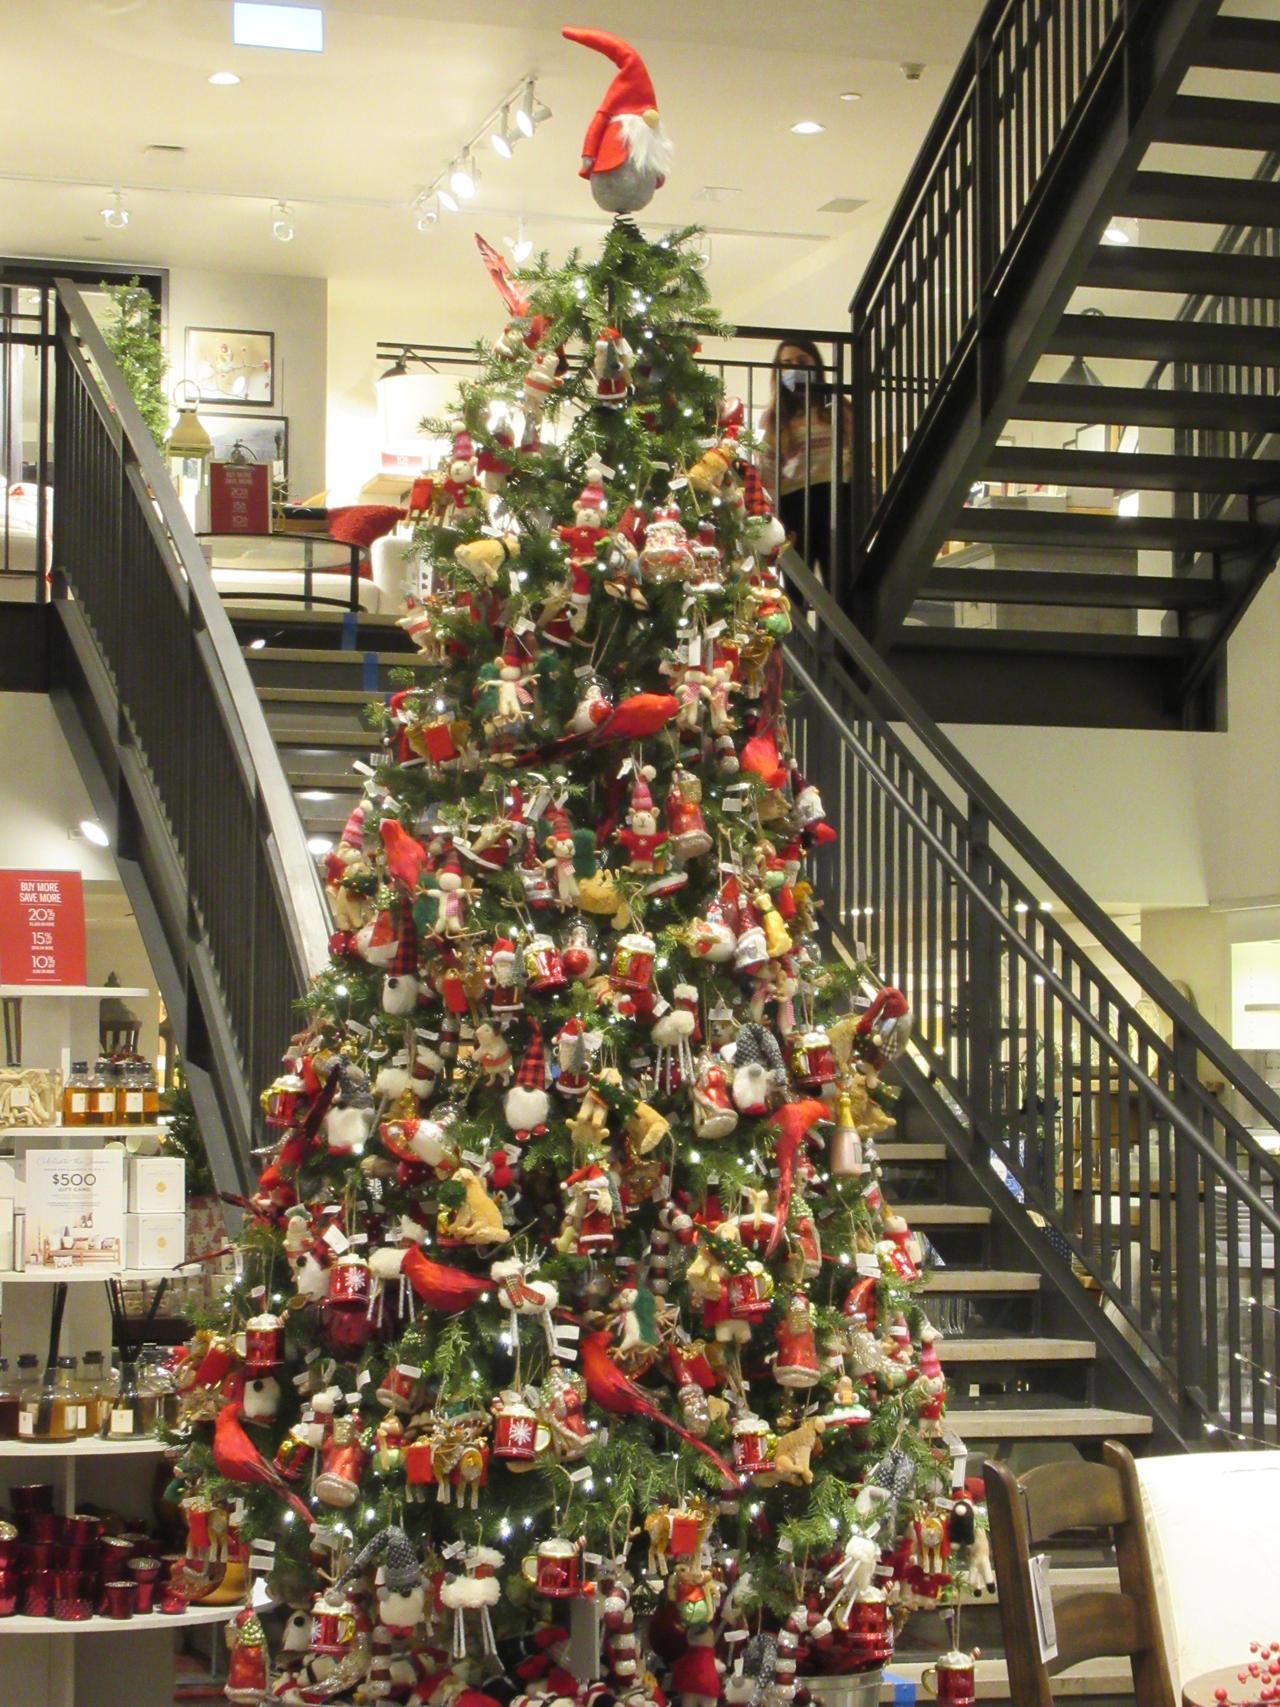 Pottery Barn Christmas Tree By Codetski101 On Deviantart